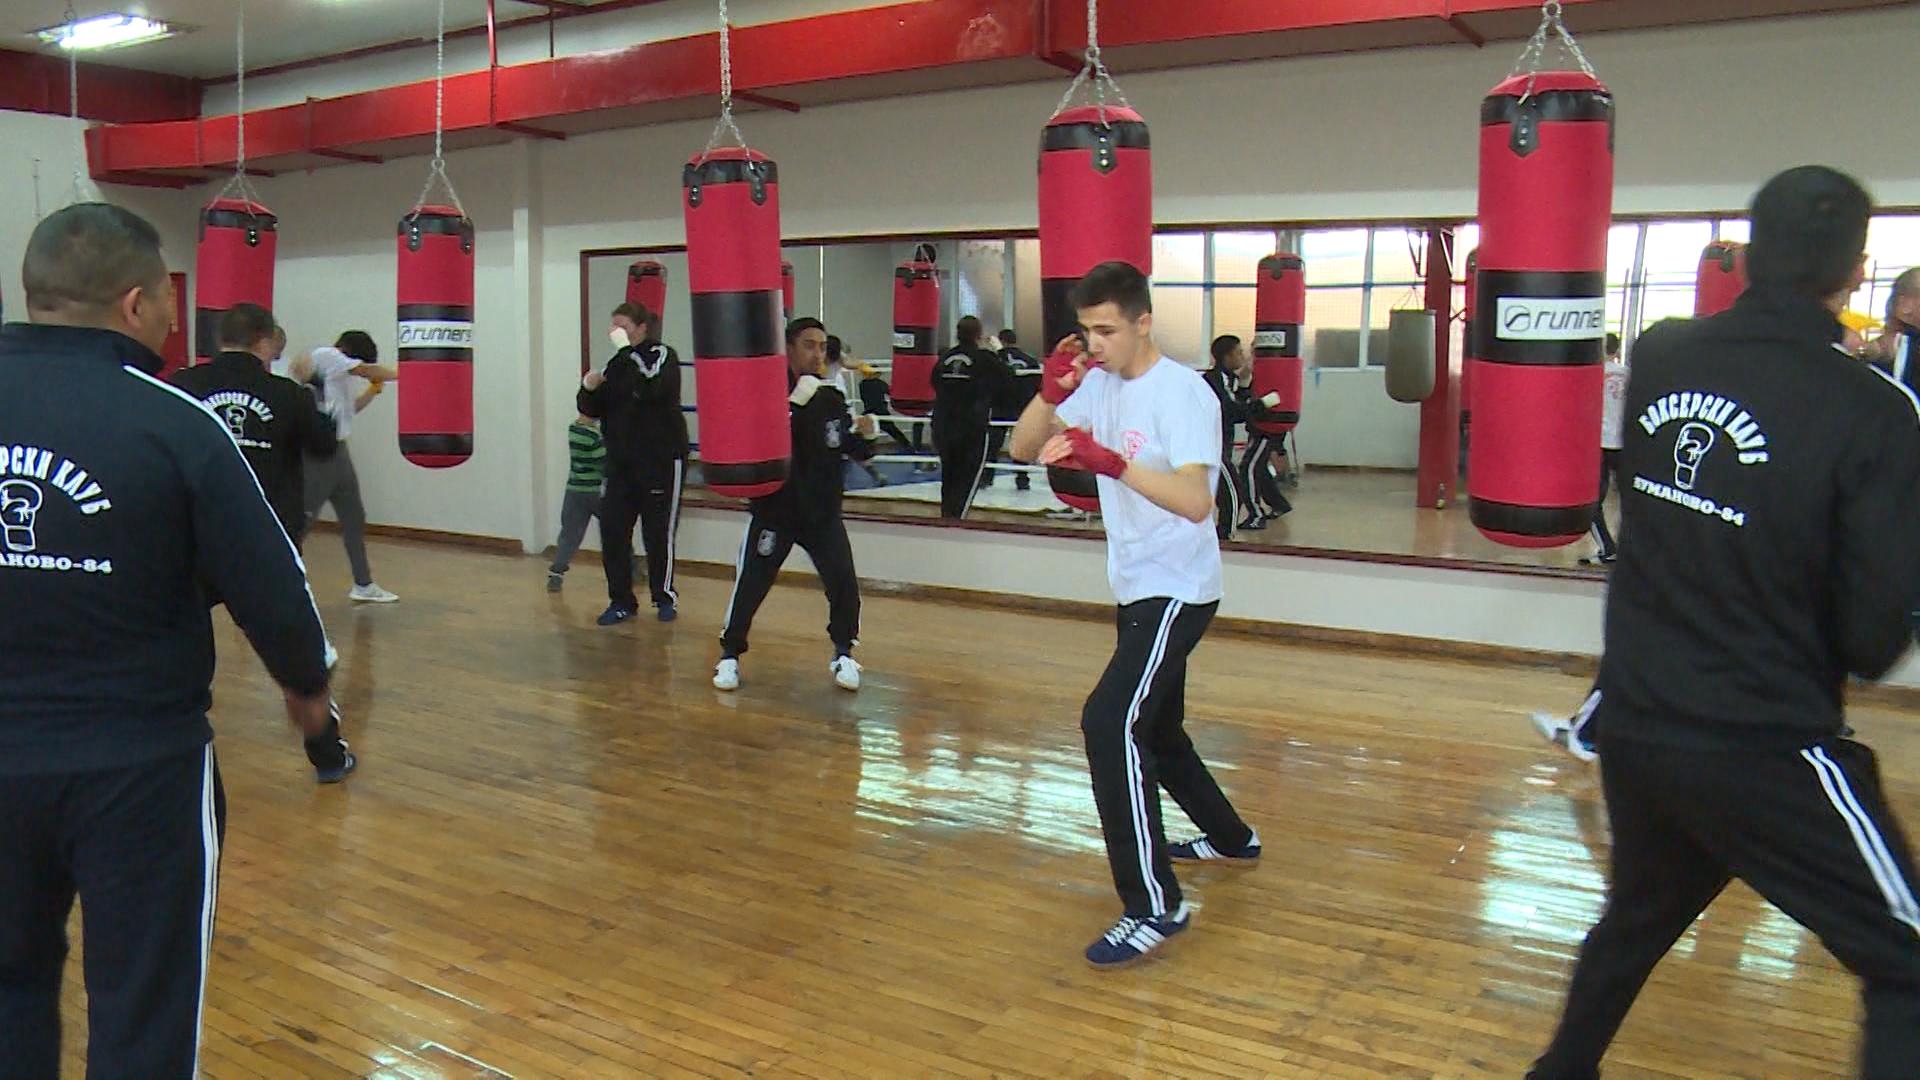 Куманово доби нов боксерски клуб